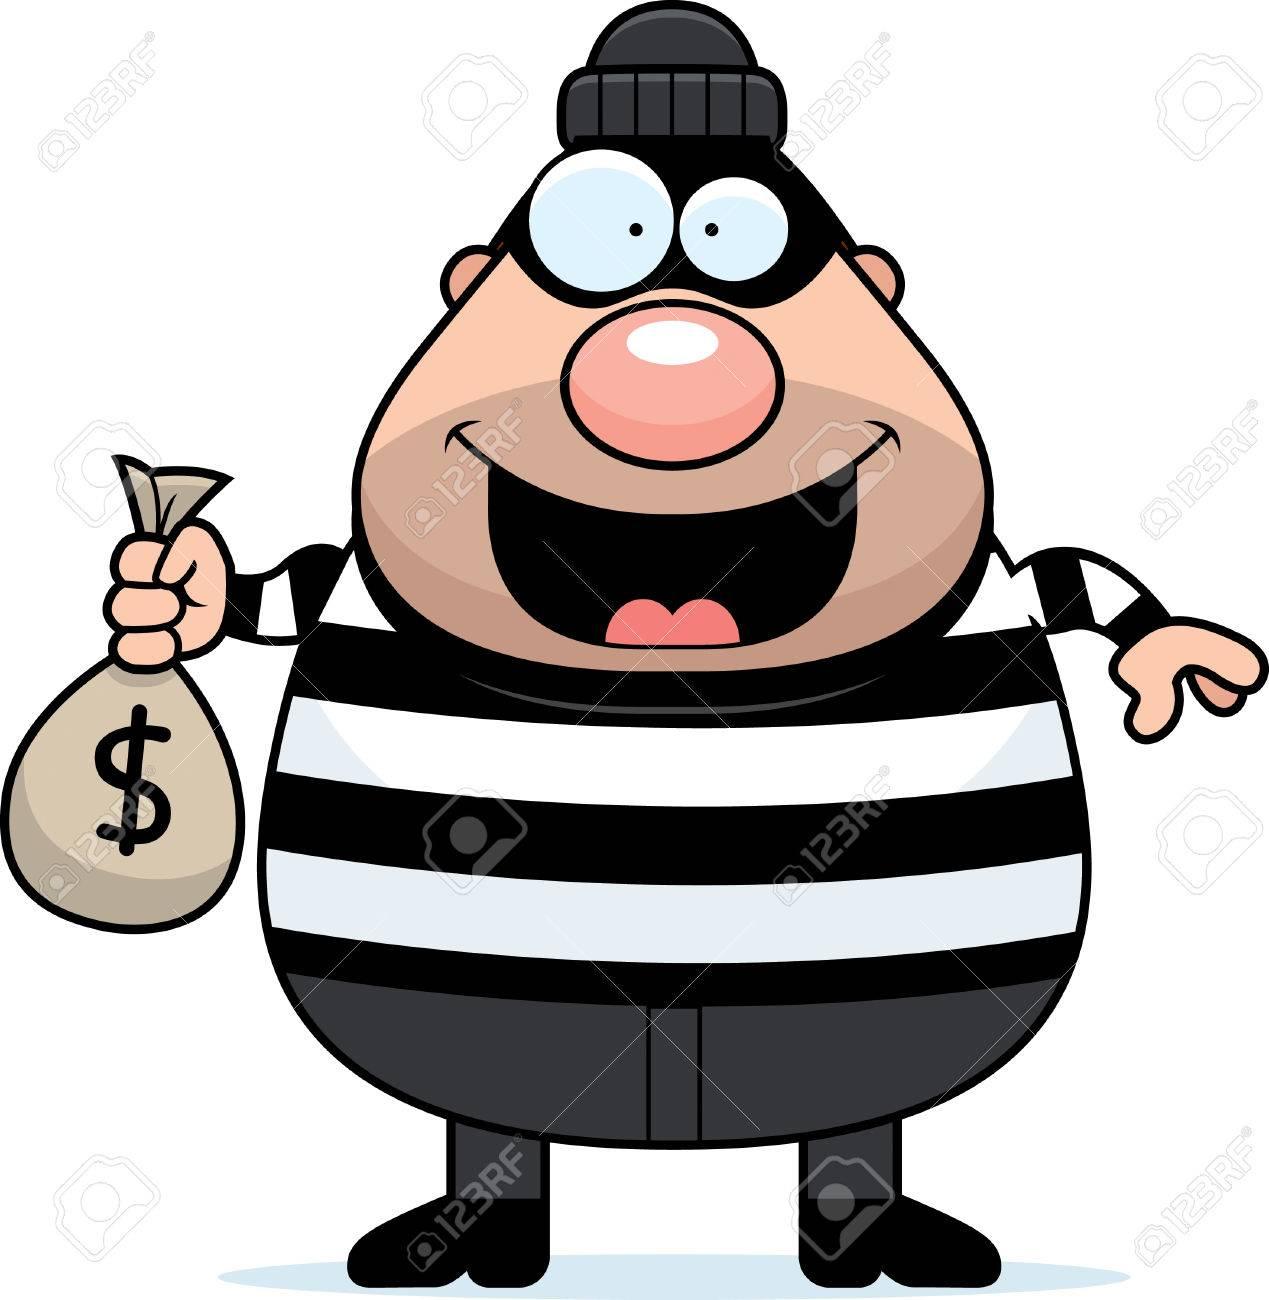 a cartoon illustration of a burglar with a moneybag royalty free rh 123rf com burglar alarm clipart animated burglar clipart